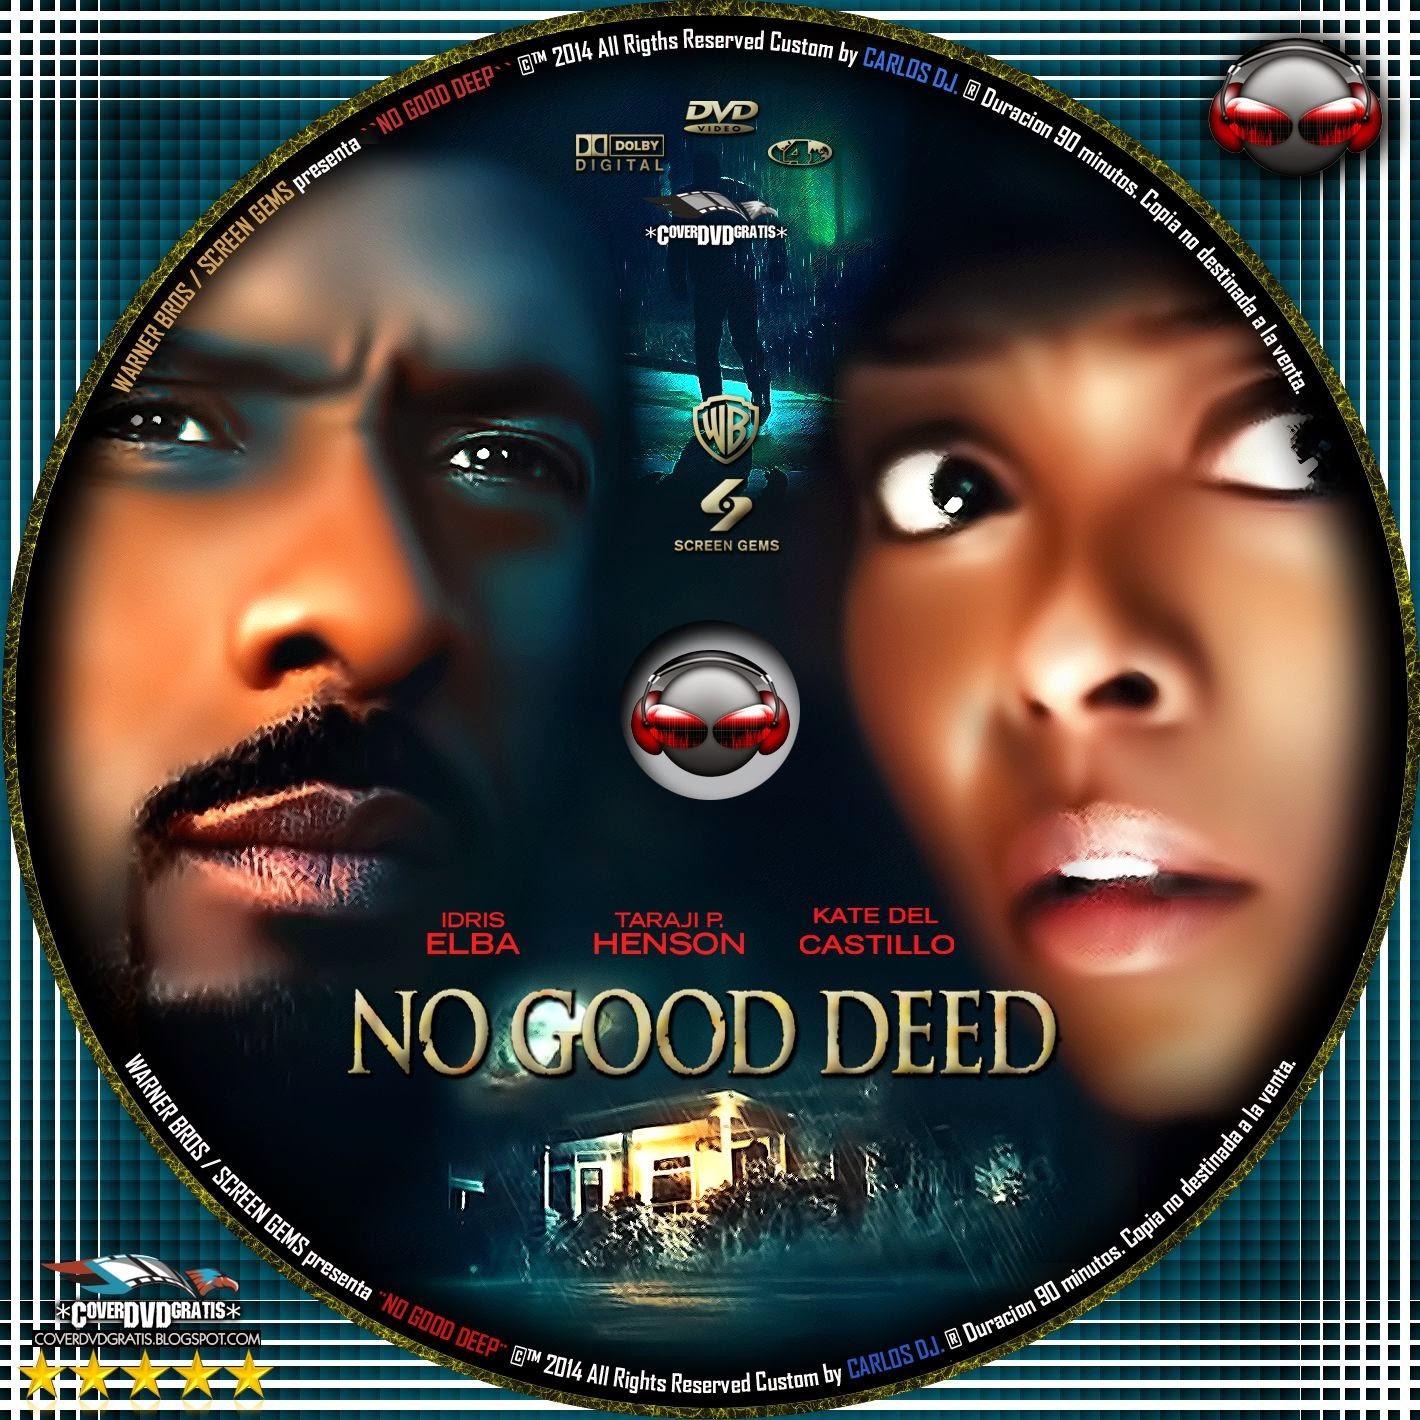 No Good Deed 2014 DVD COVER - CoverDvdGratis